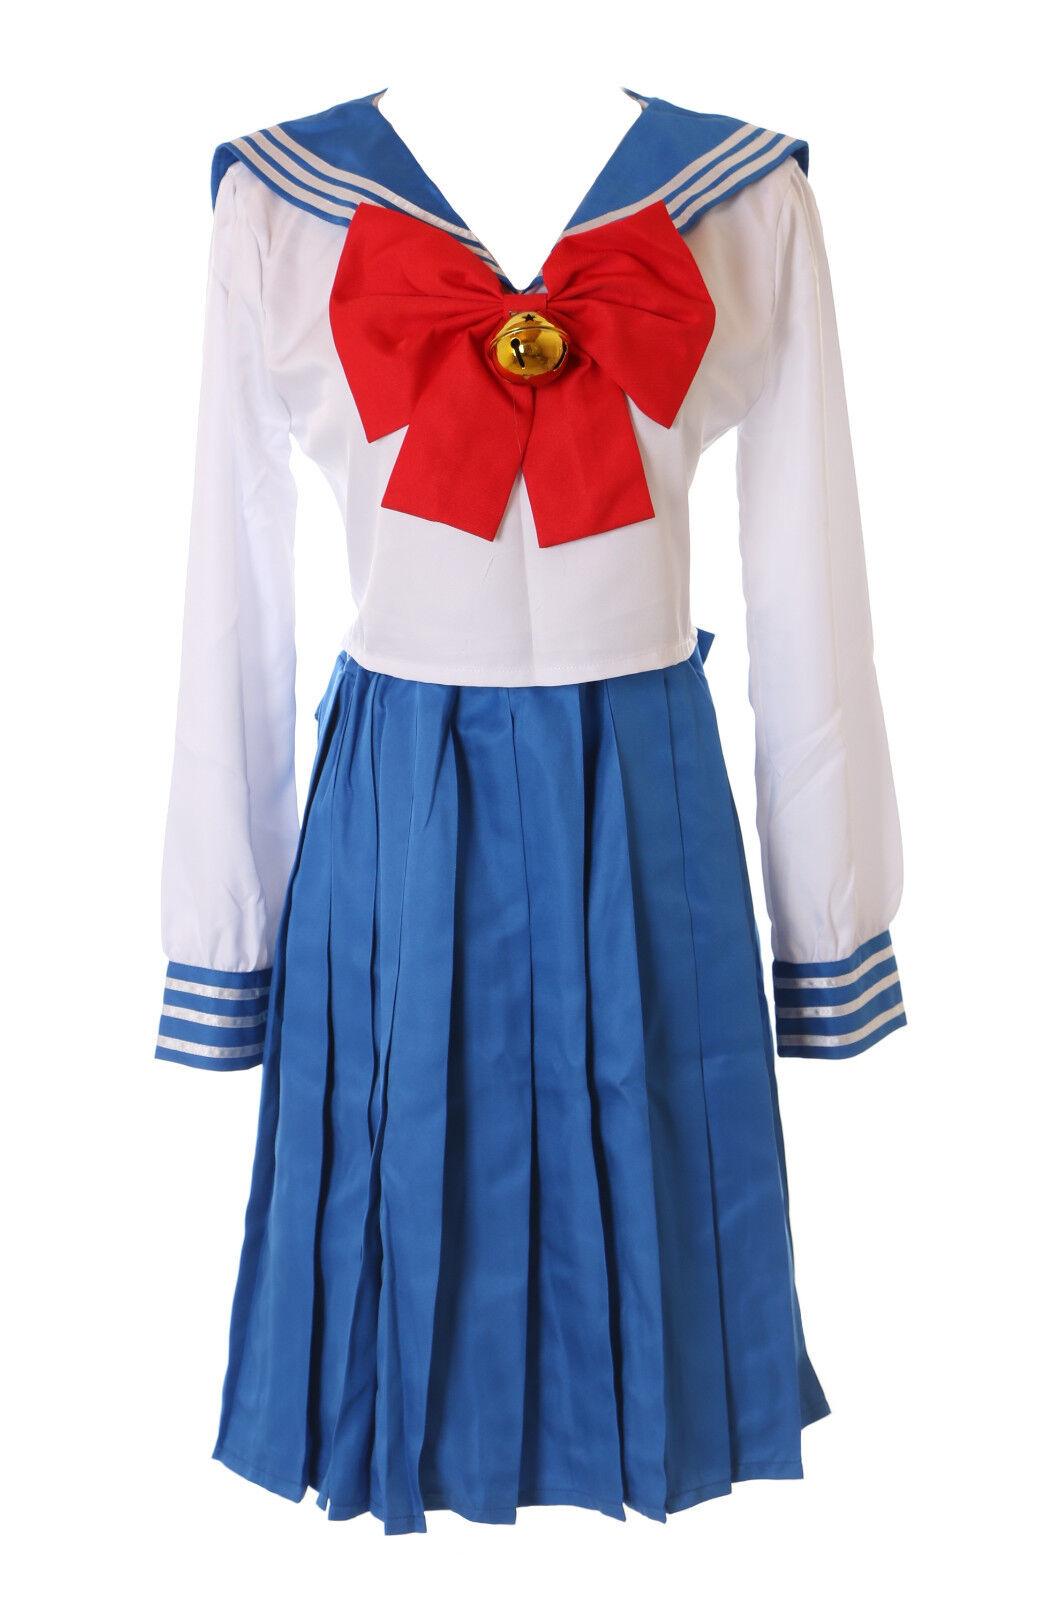 MN-76 Sailor Moon Usagi Bunny blau weiß Japan Schuluniform 5-TLG. Set Cosplay     | Die Königin Der Qualität